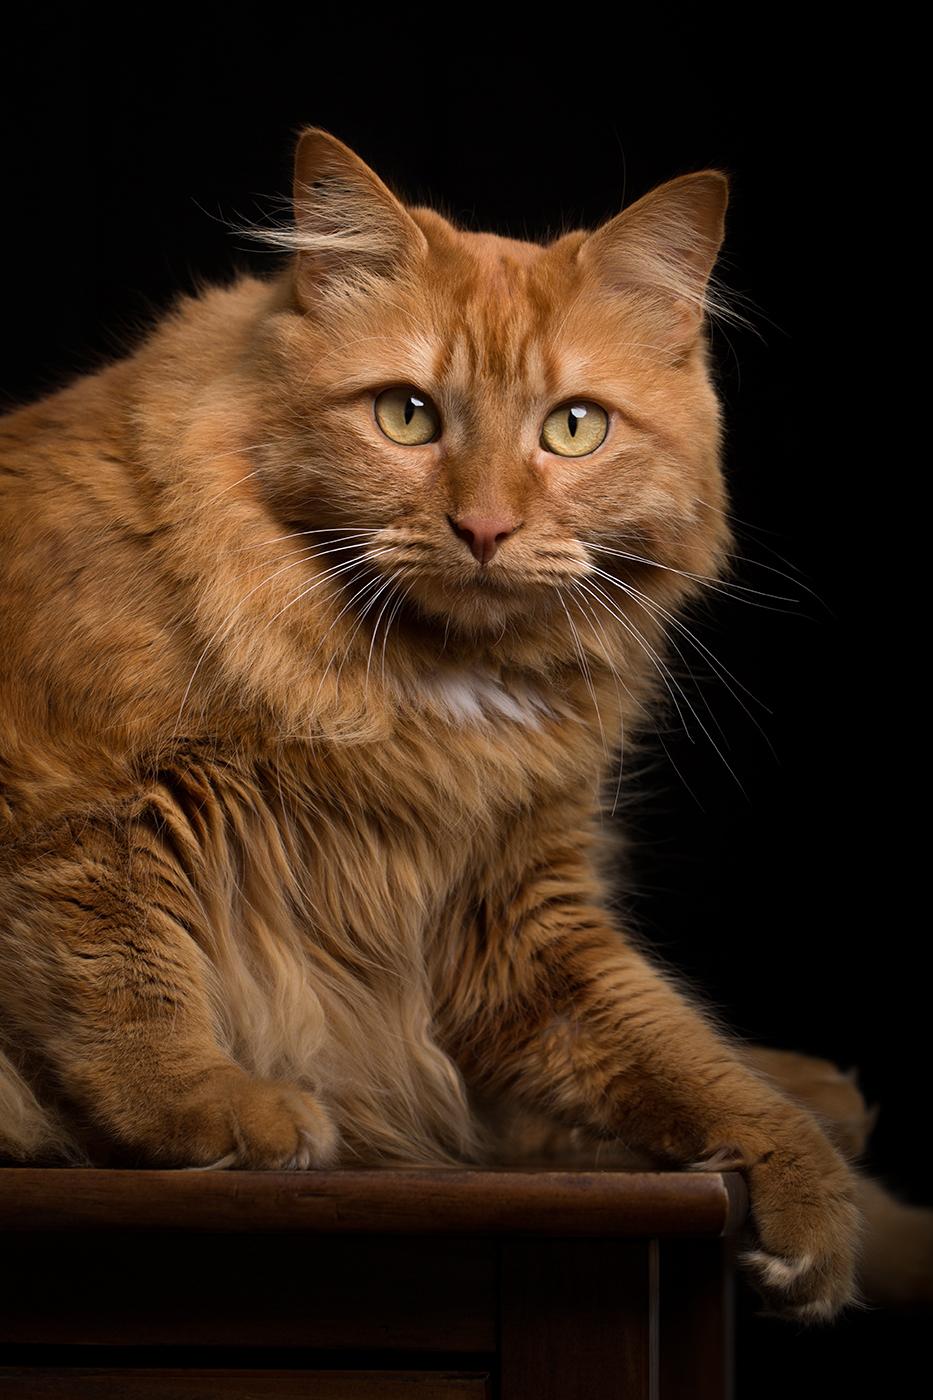 photographe-animaux-domestiques-chat-guillaume-héraud